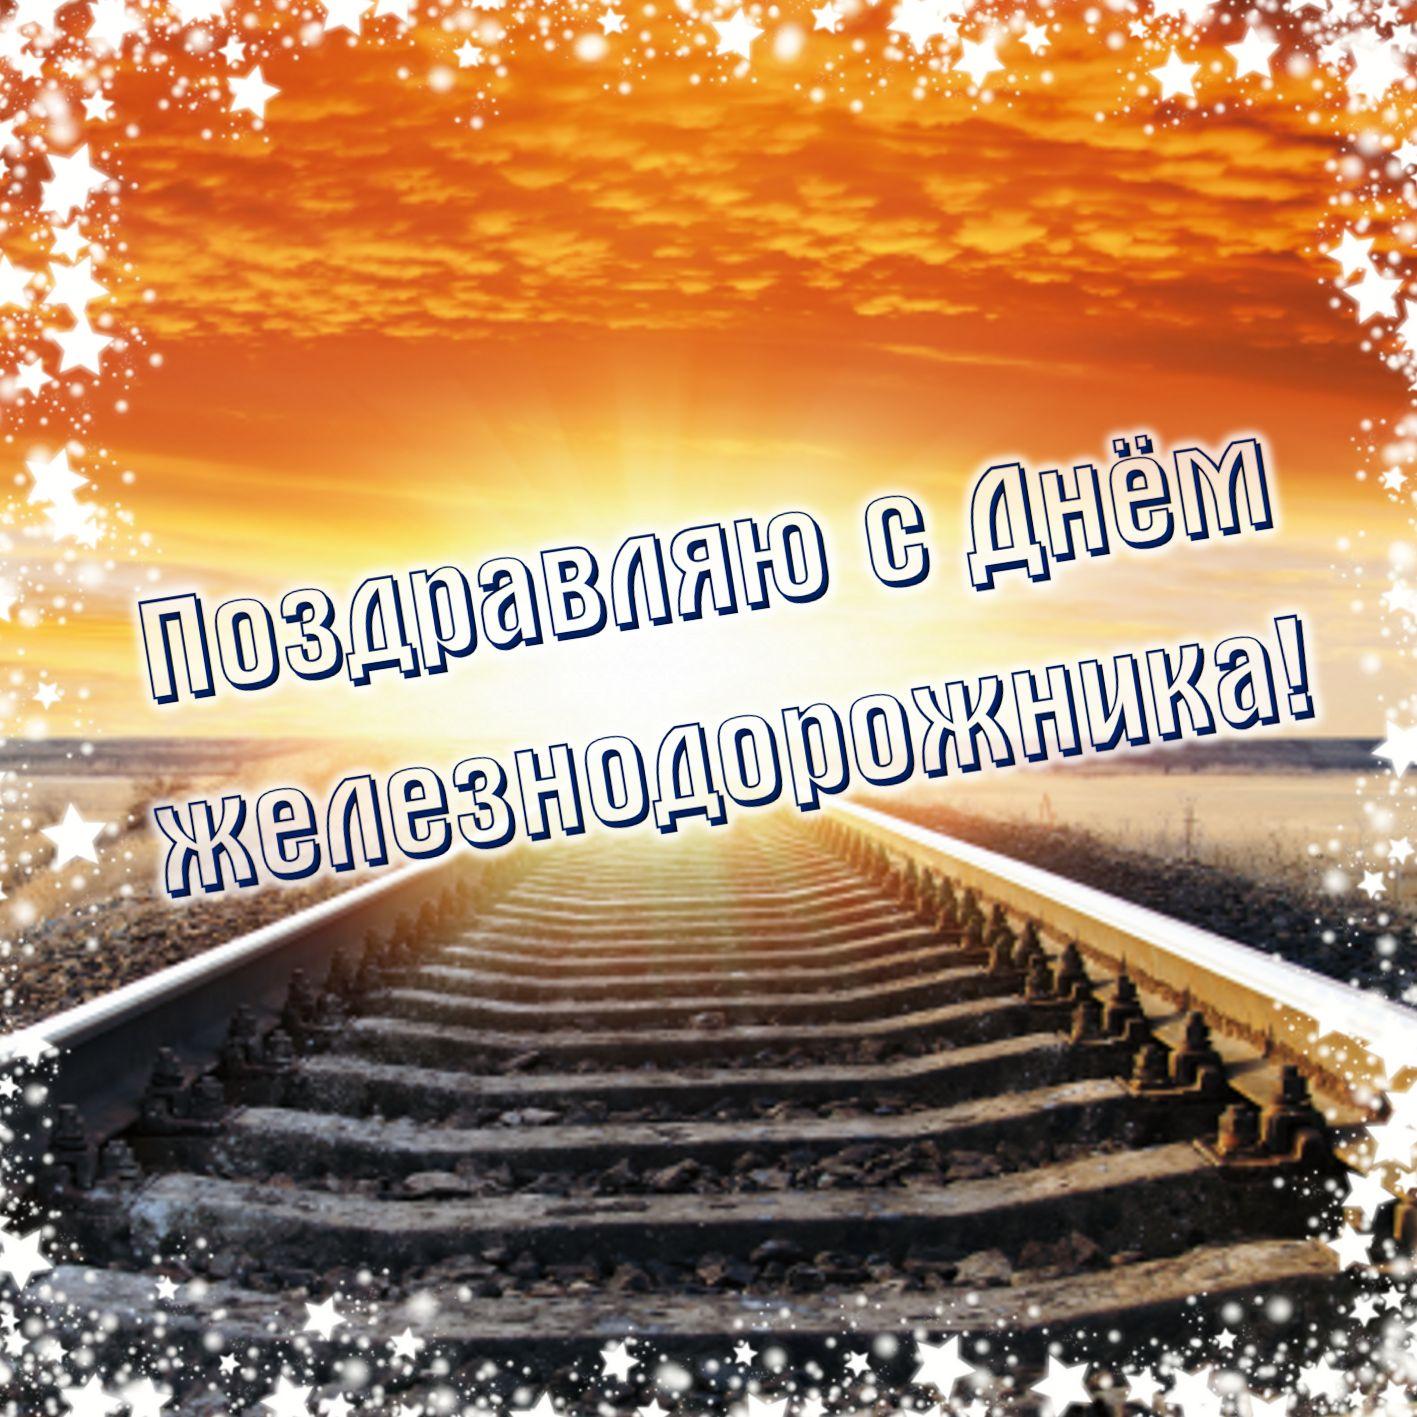 да, с днем железнодорожника картинки открытки ивангороде